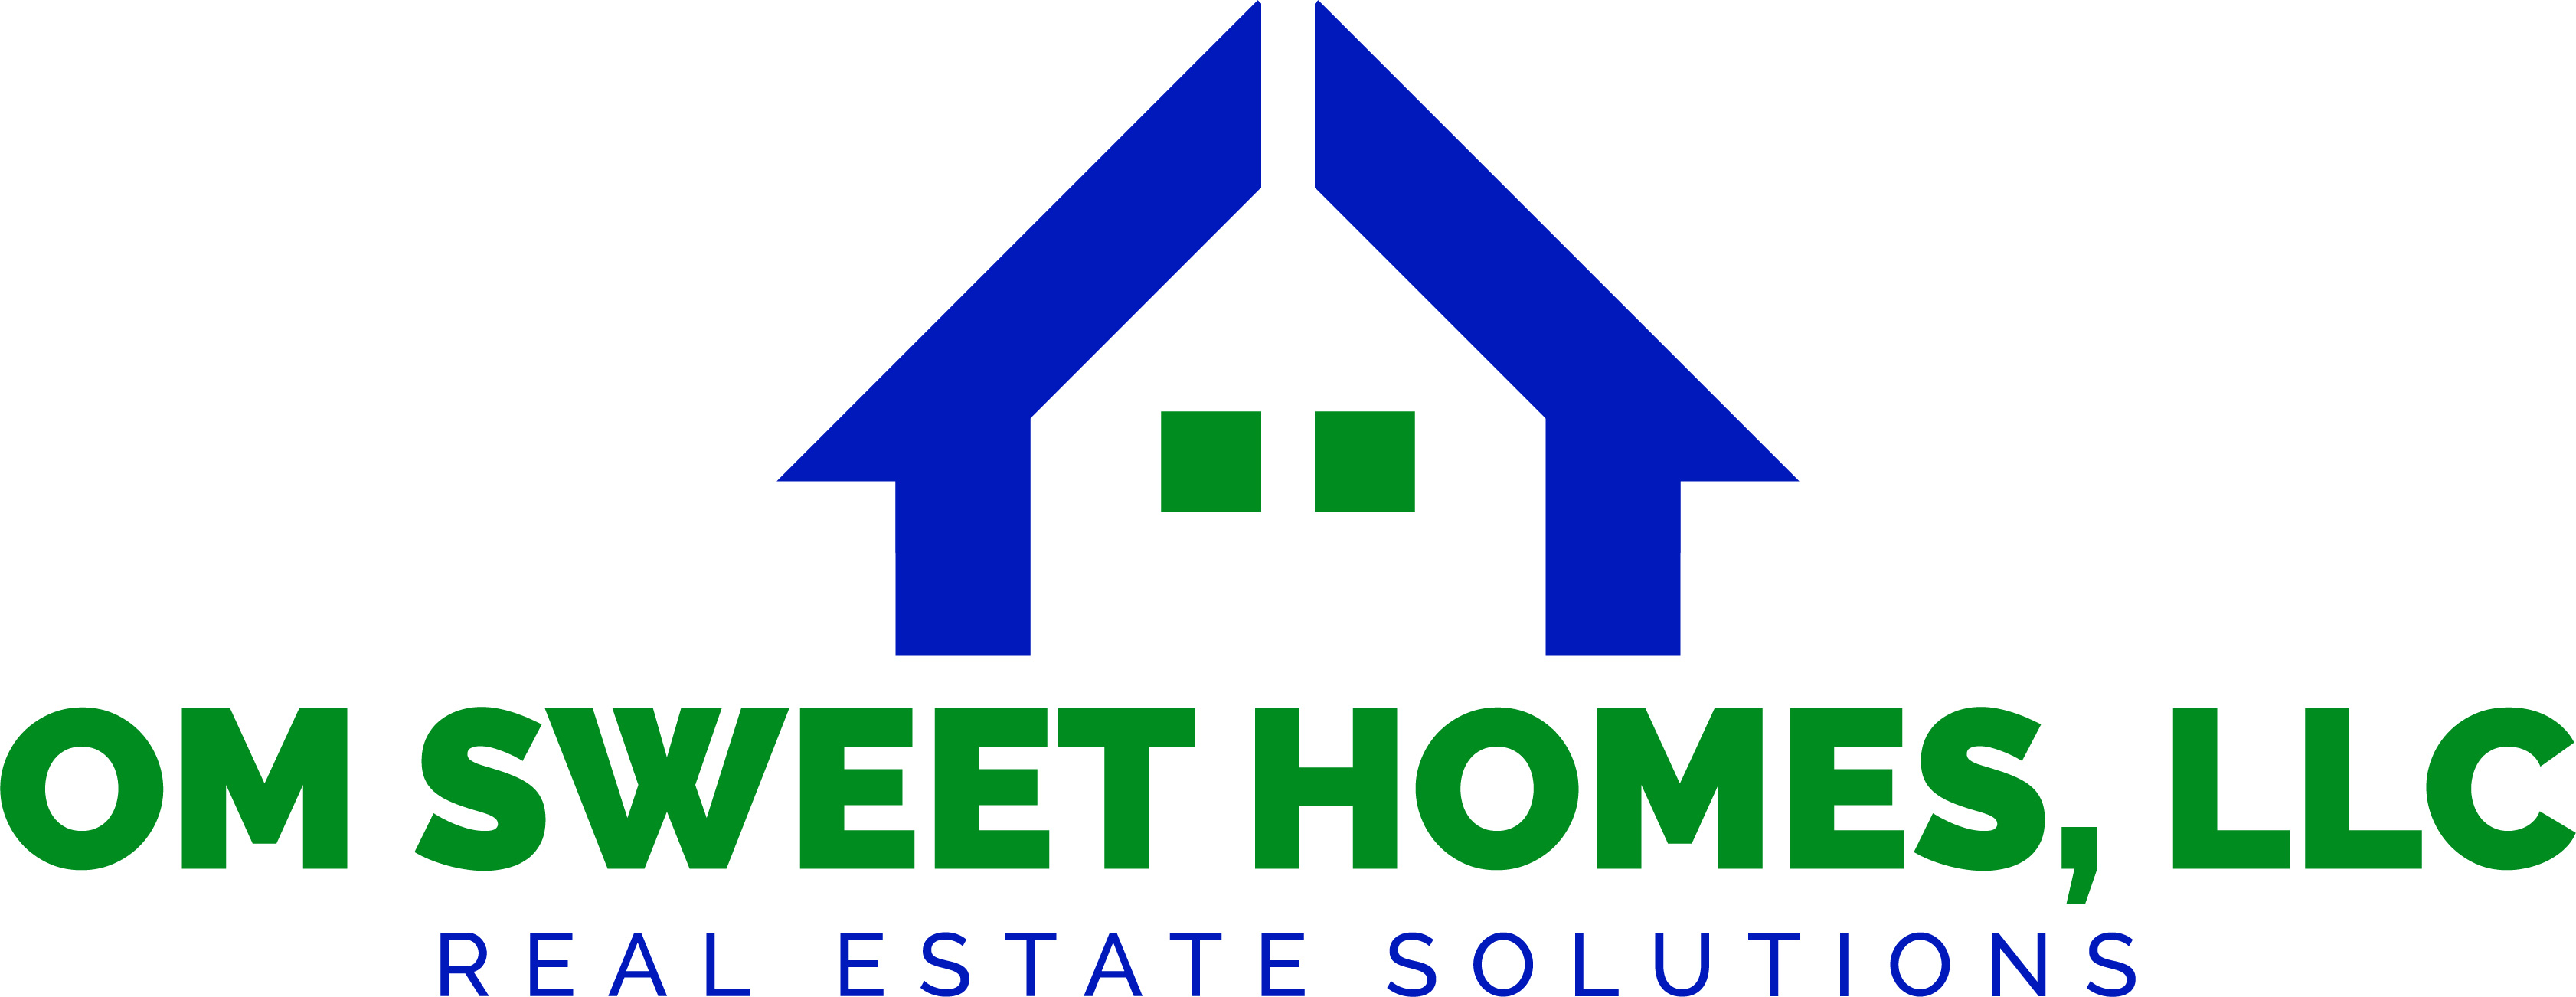 OM Sweet Homes  LLC